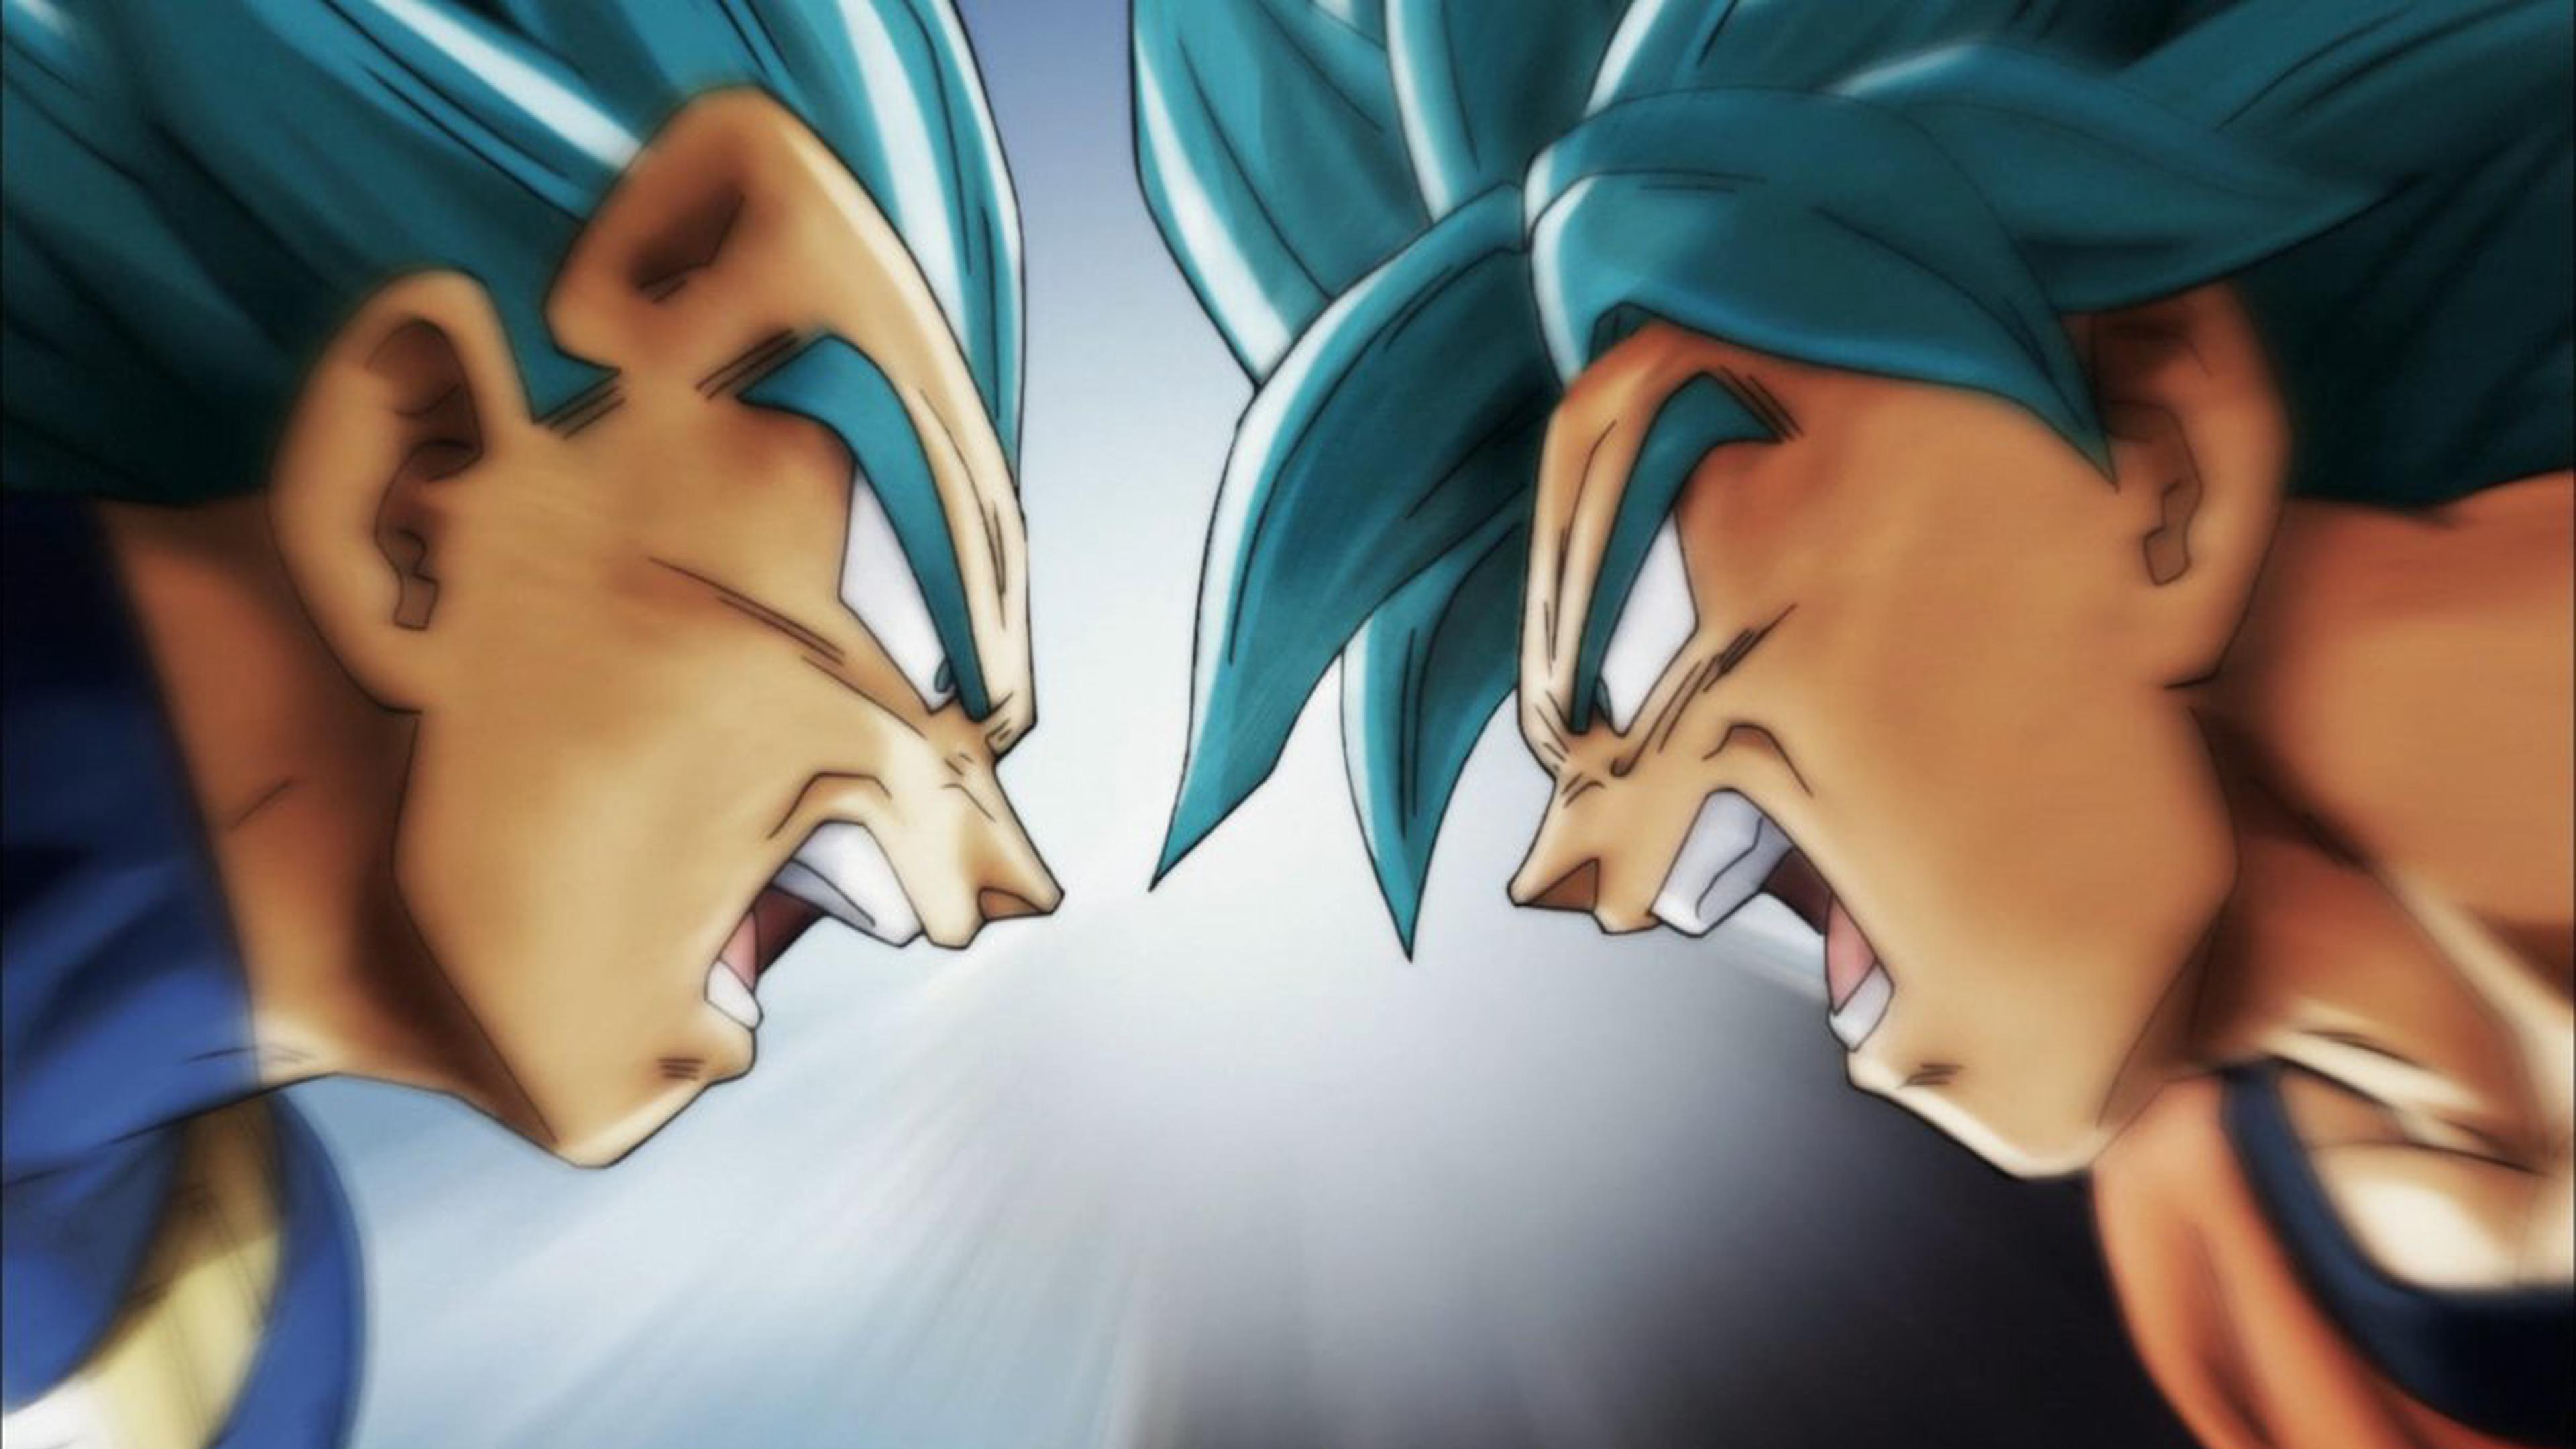 Dragon Ball Super Last Episode Goku Vegeta Ps4wallpaperscom